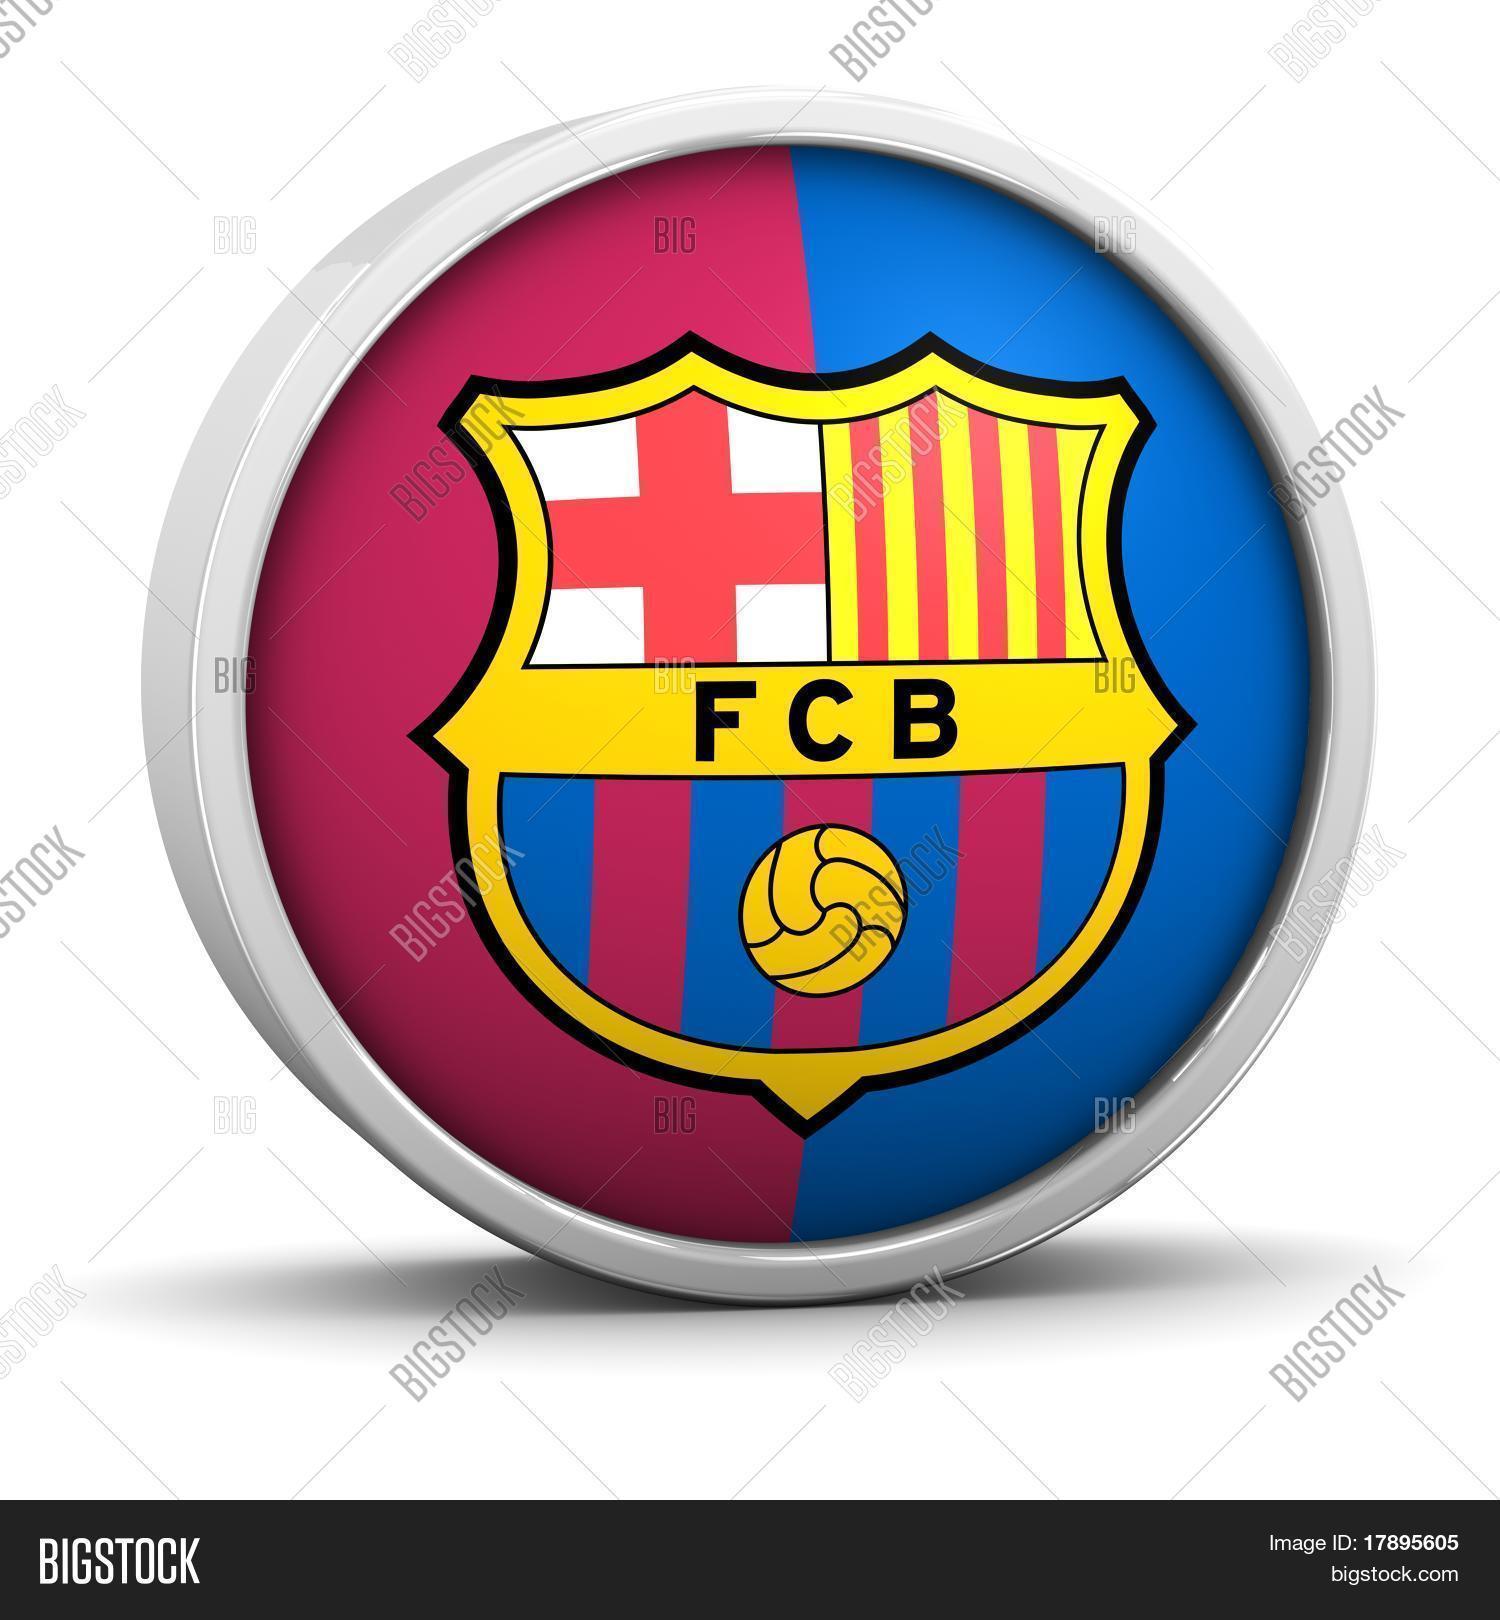 Barcelona Symbol Round Image Photo Free Trial Bigstock